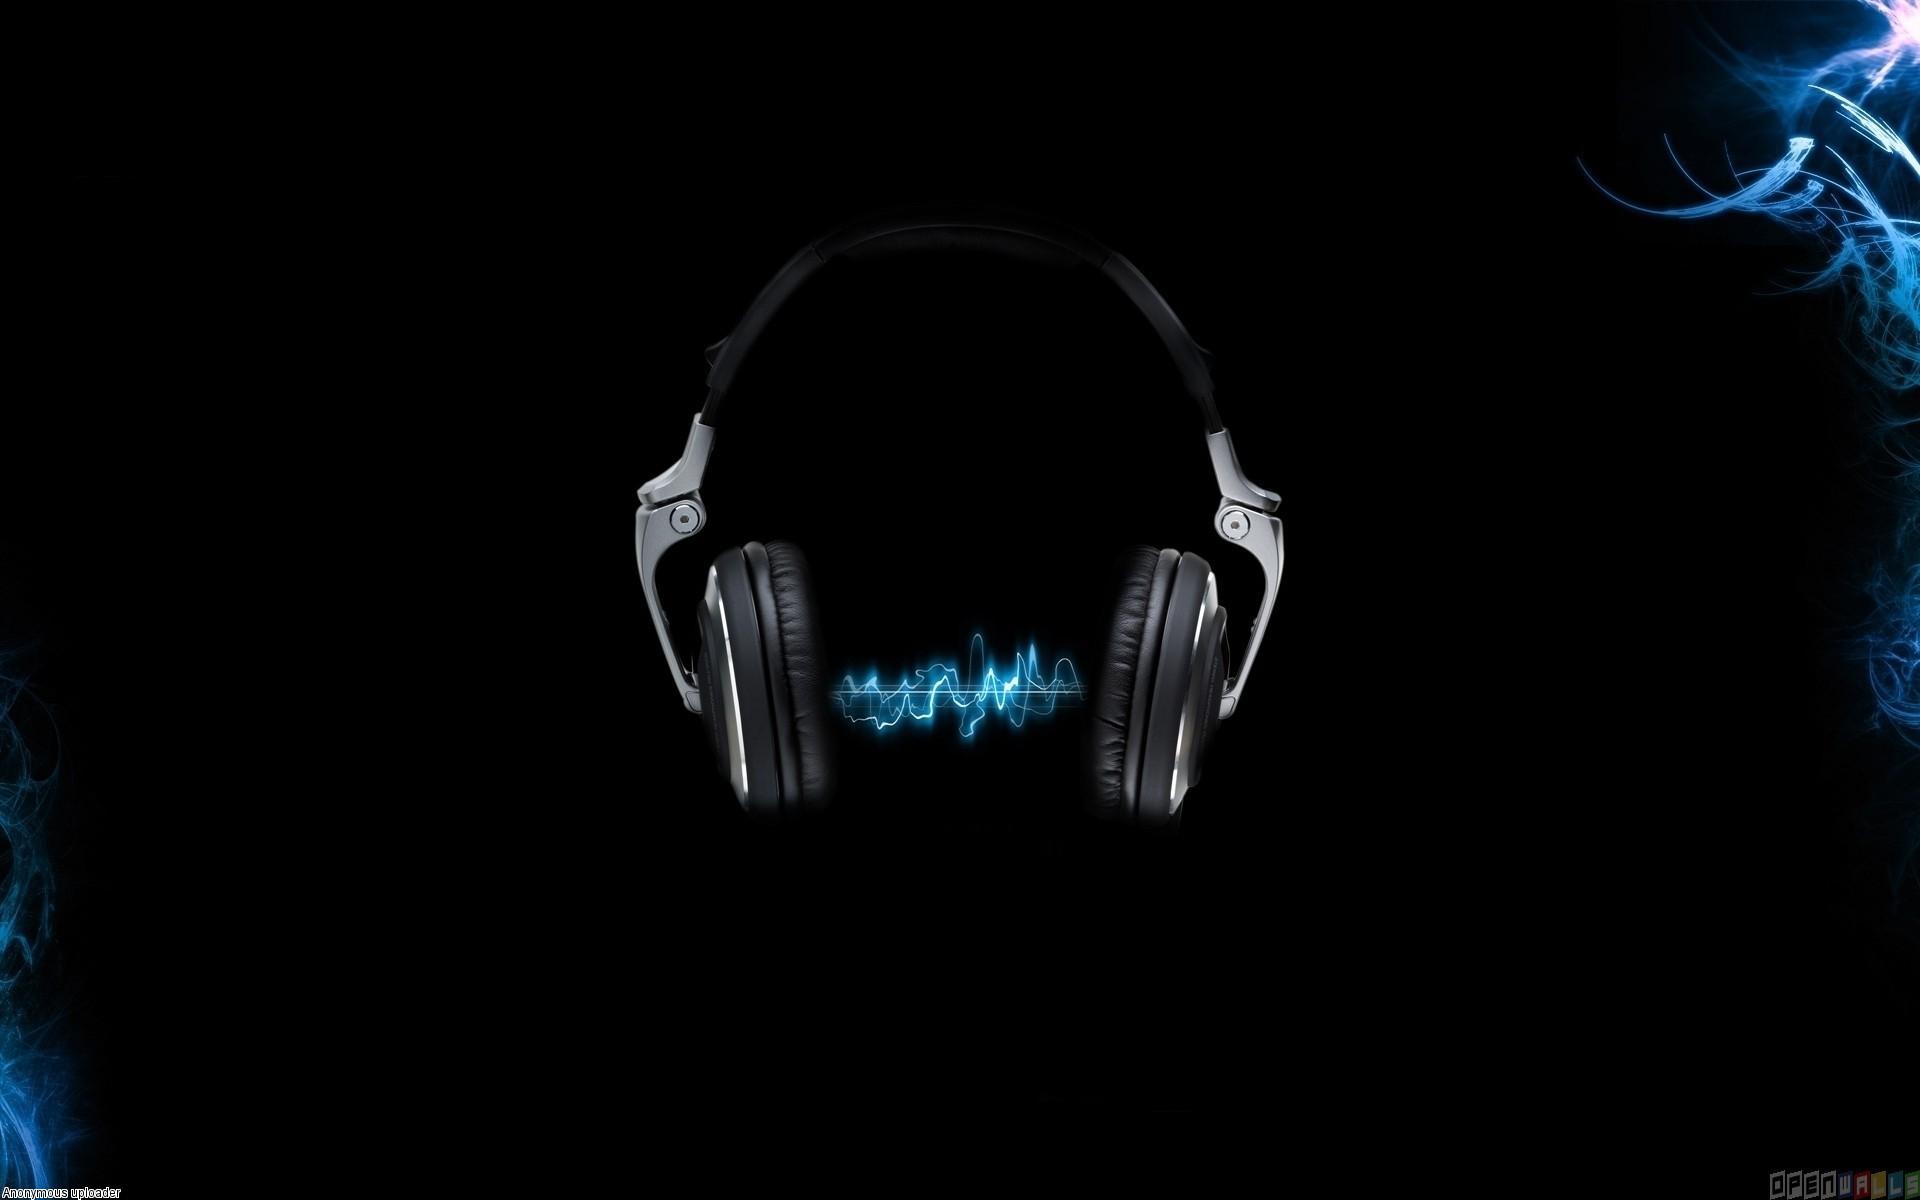 Sound Desktop Background Themes Weird Wavesound Blue HD wallpapers 1920x1200